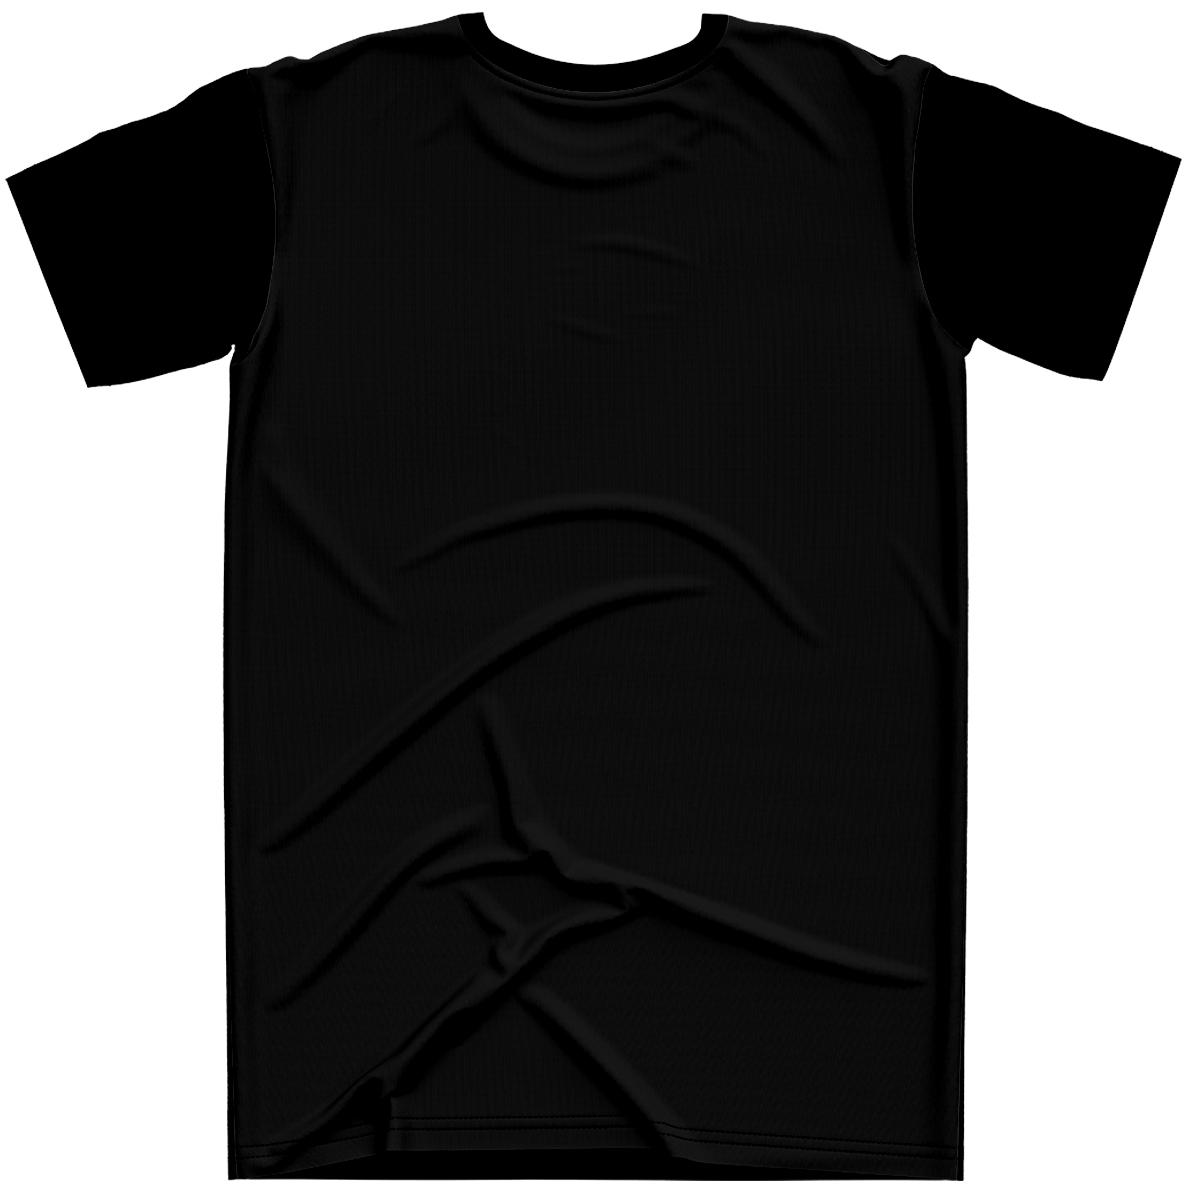 Stompy Camiseta Estampada Masculina Modelo 153